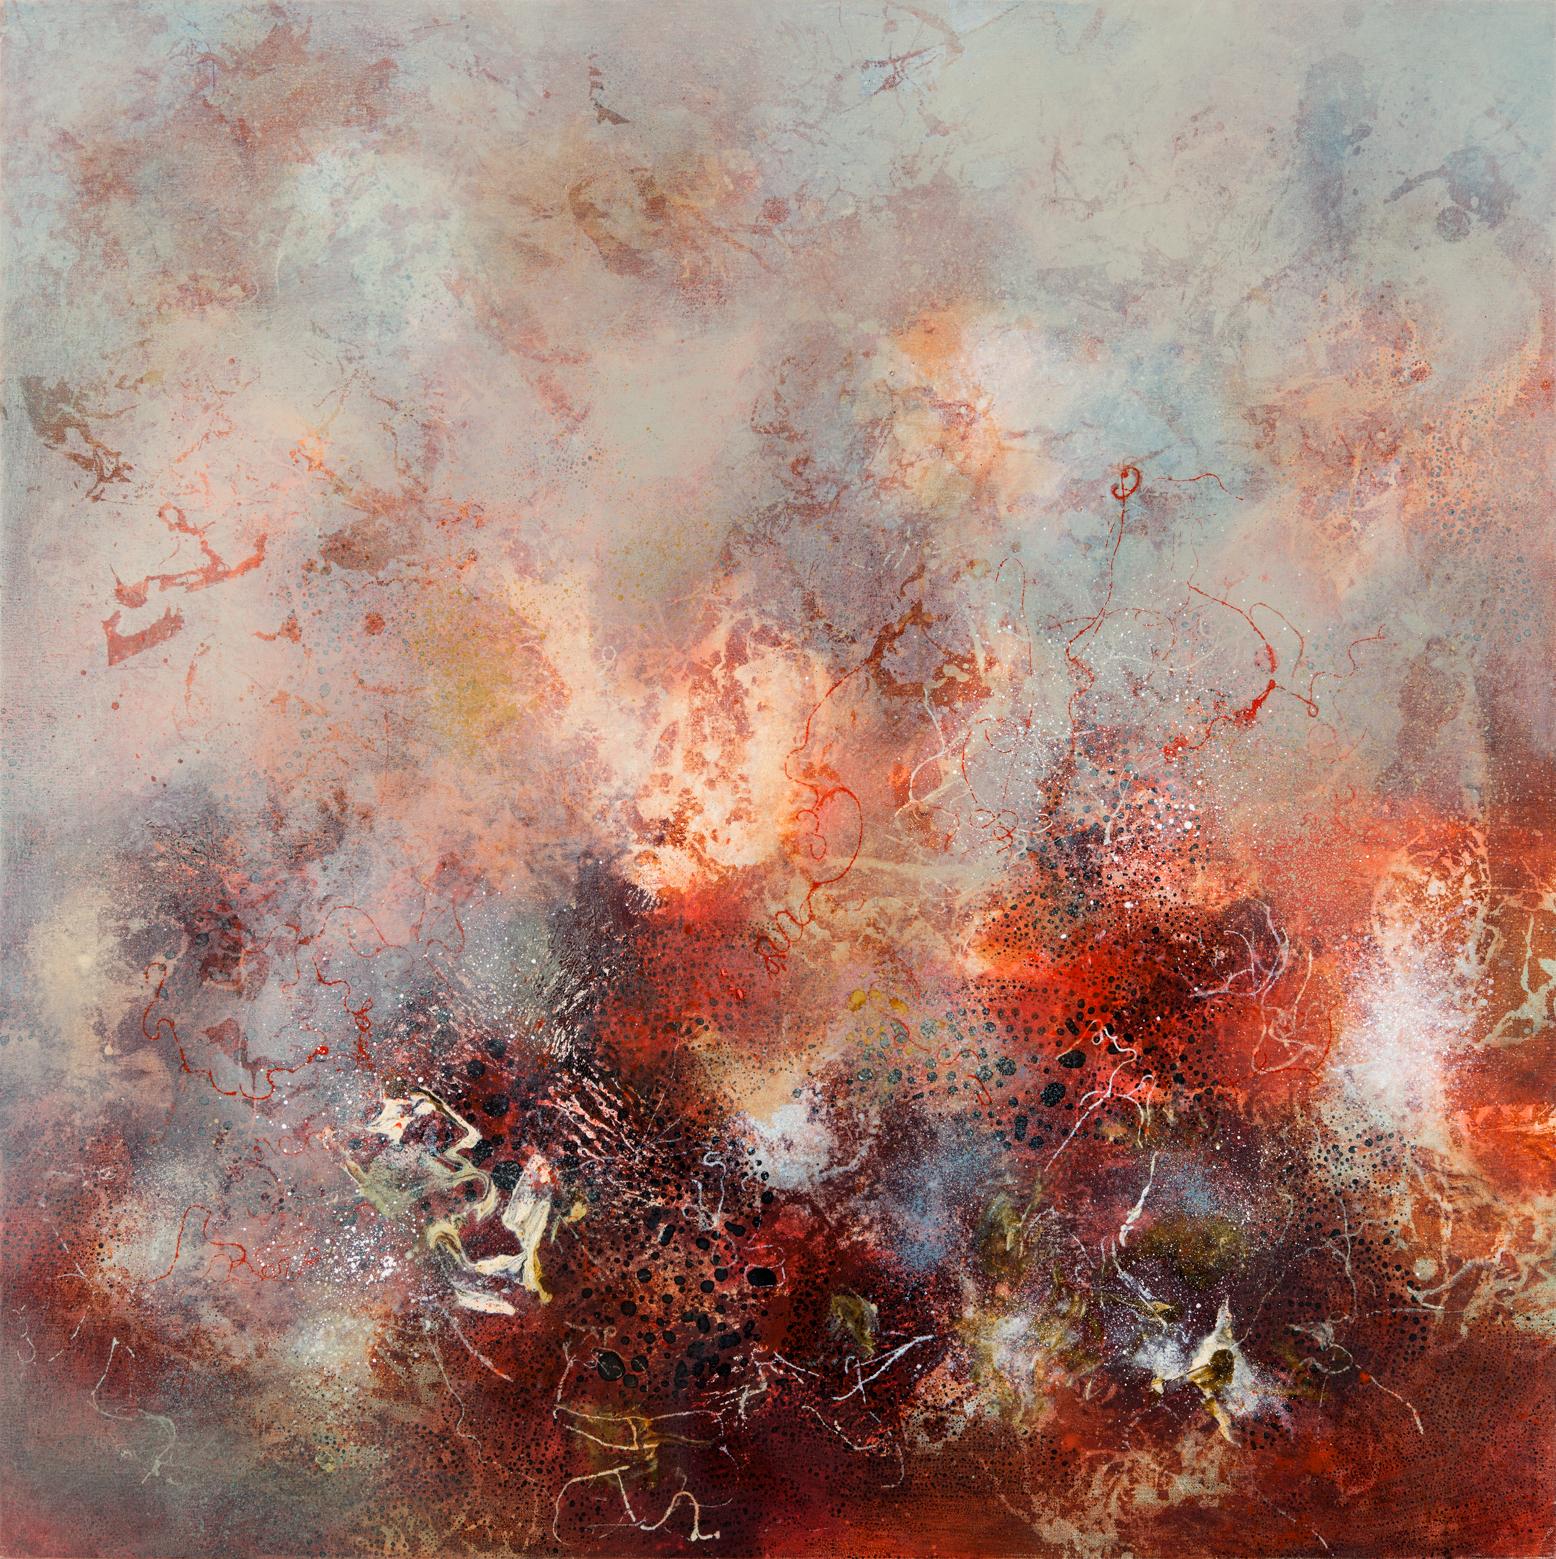 Primal Matter III, oil on canvas, 102 x 102 cm